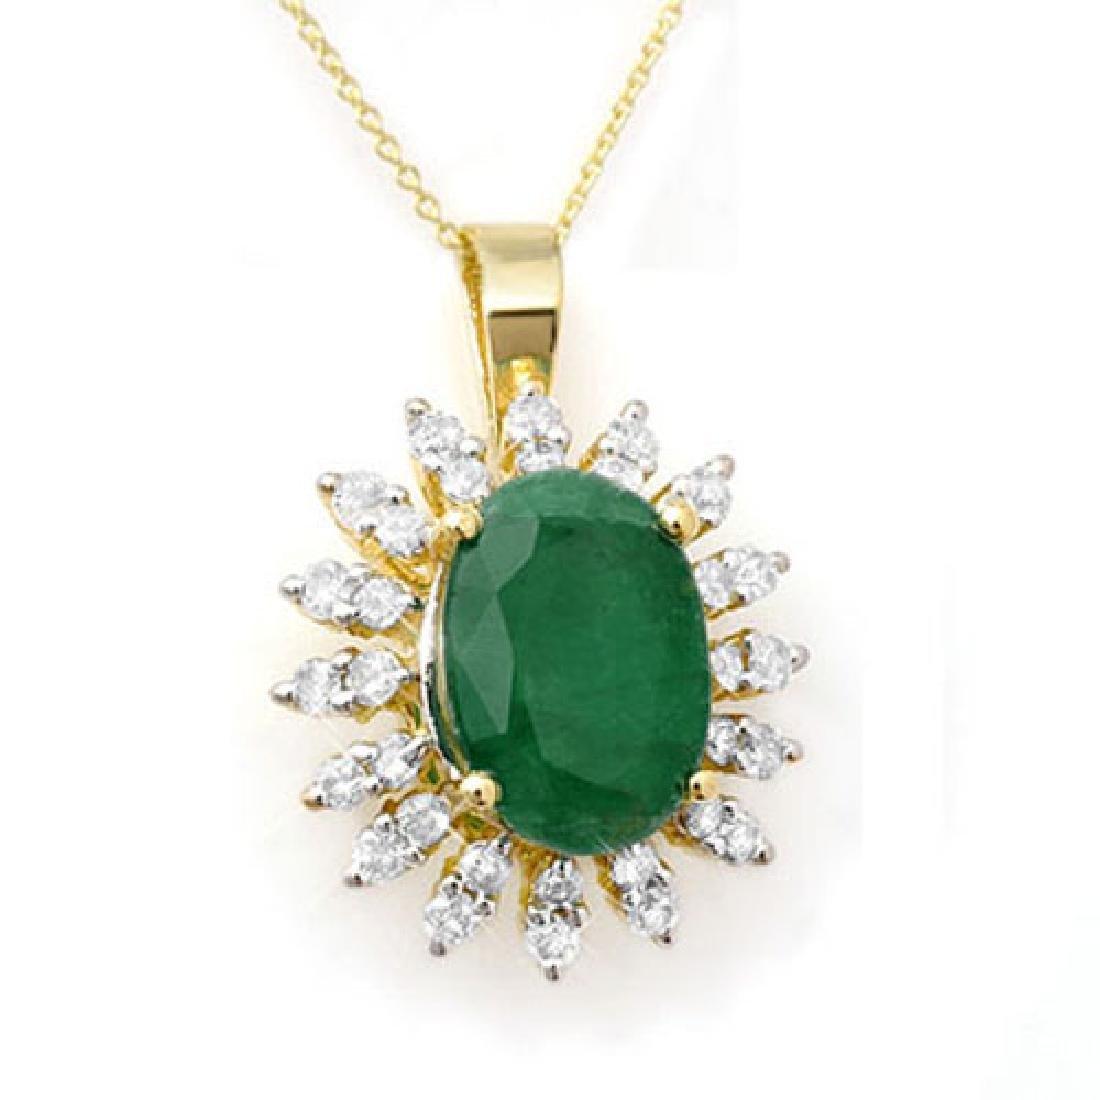 6.21 CTW Emerald & Diamond Pendant 14K Yellow Gold